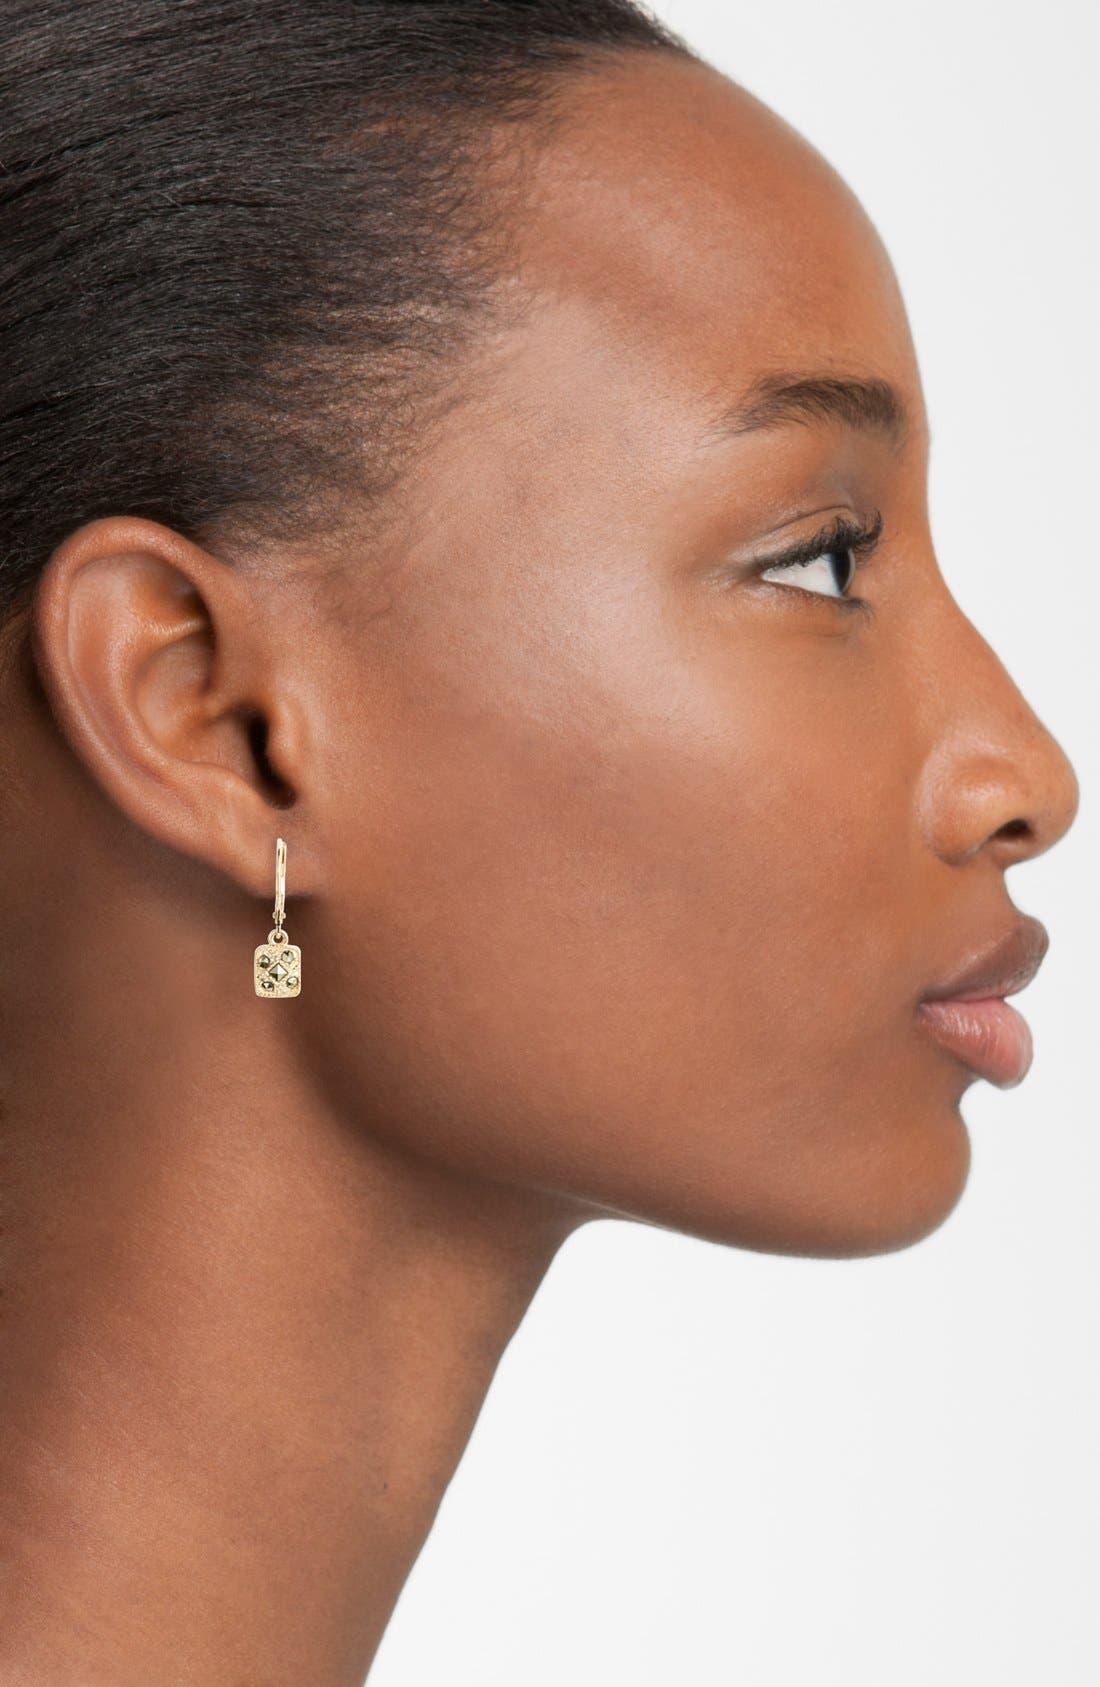 Square Drop Earrings,                             Alternate thumbnail 2, color,                             GOLD/ MARCASITE